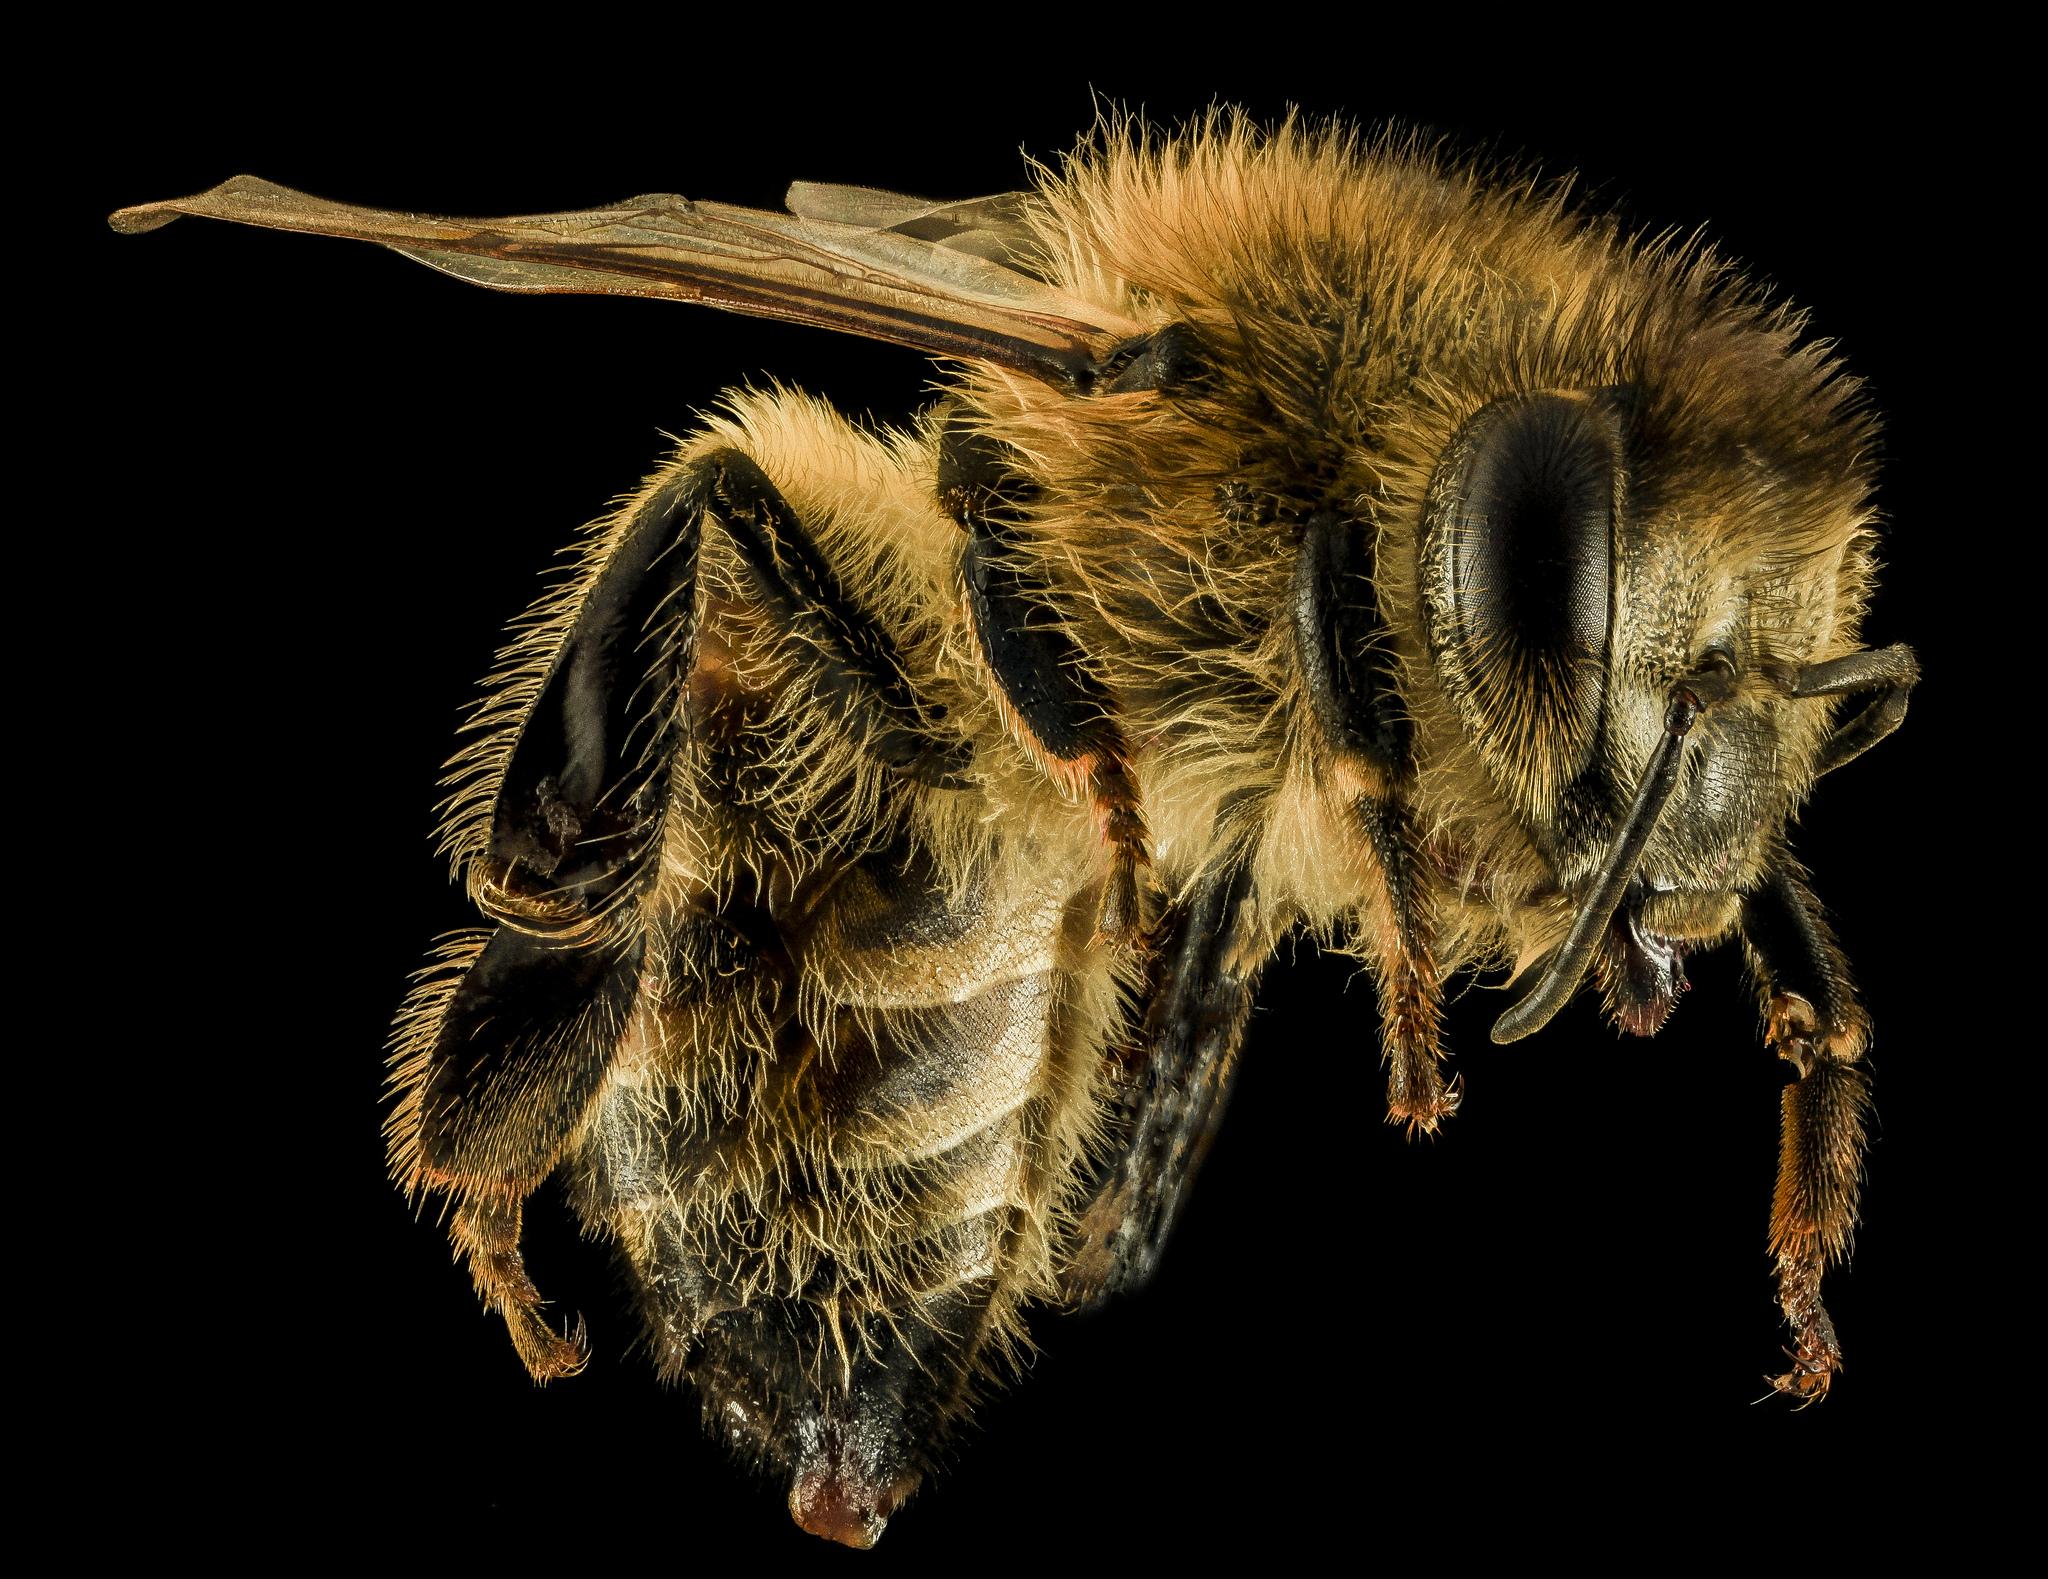 Honey bees can understand the surprisingly complex concept of zero